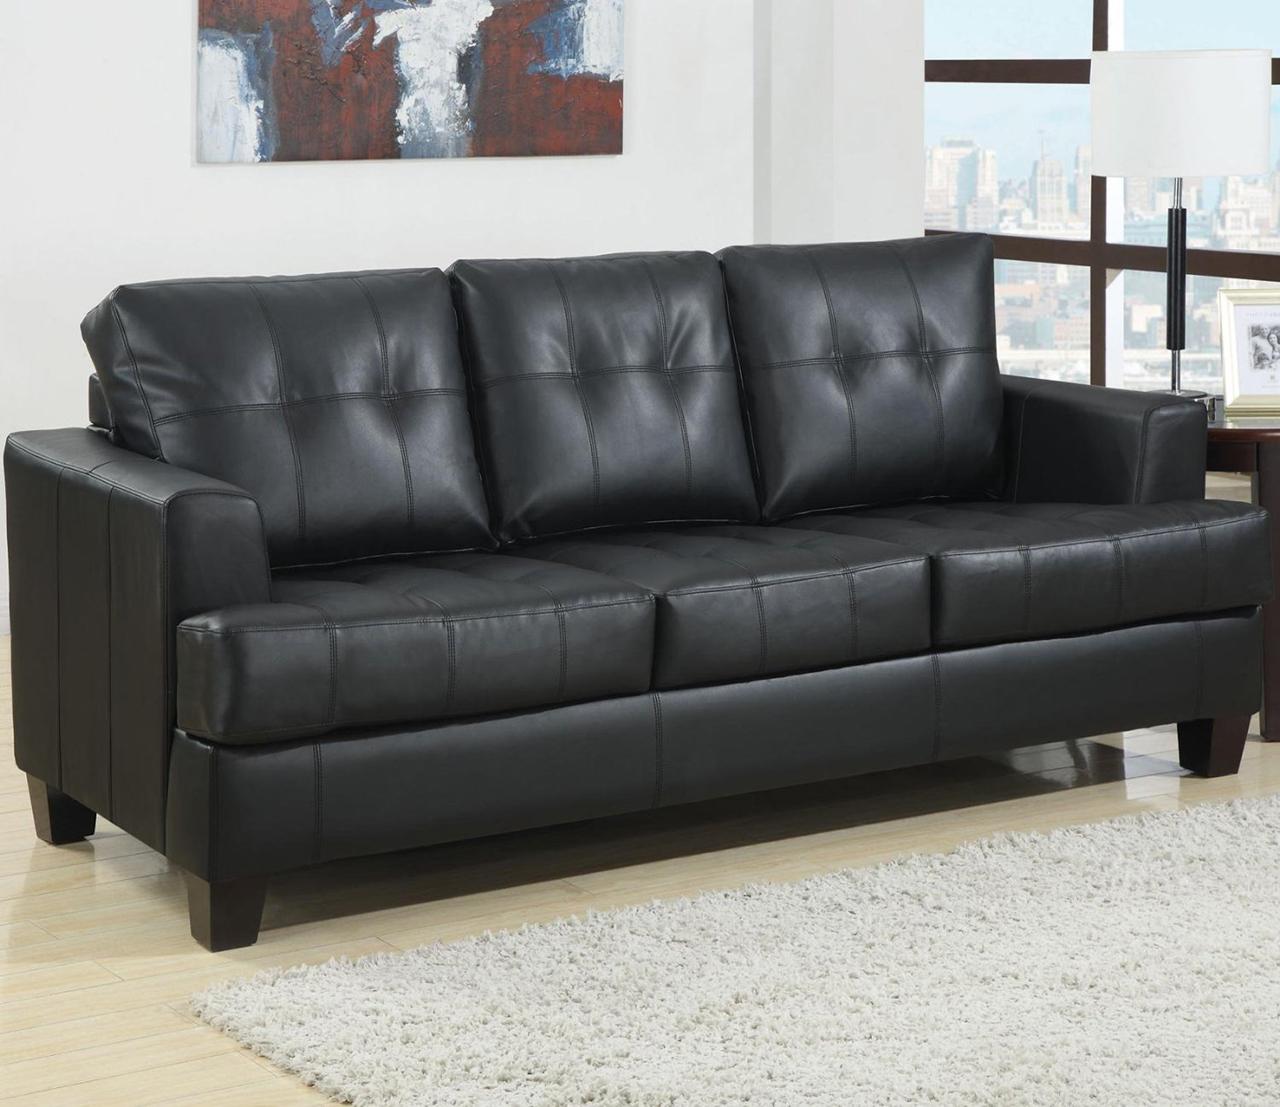 Sleeper Sofa - Coaster Home Furnishings Contemporary Sleeper, Black